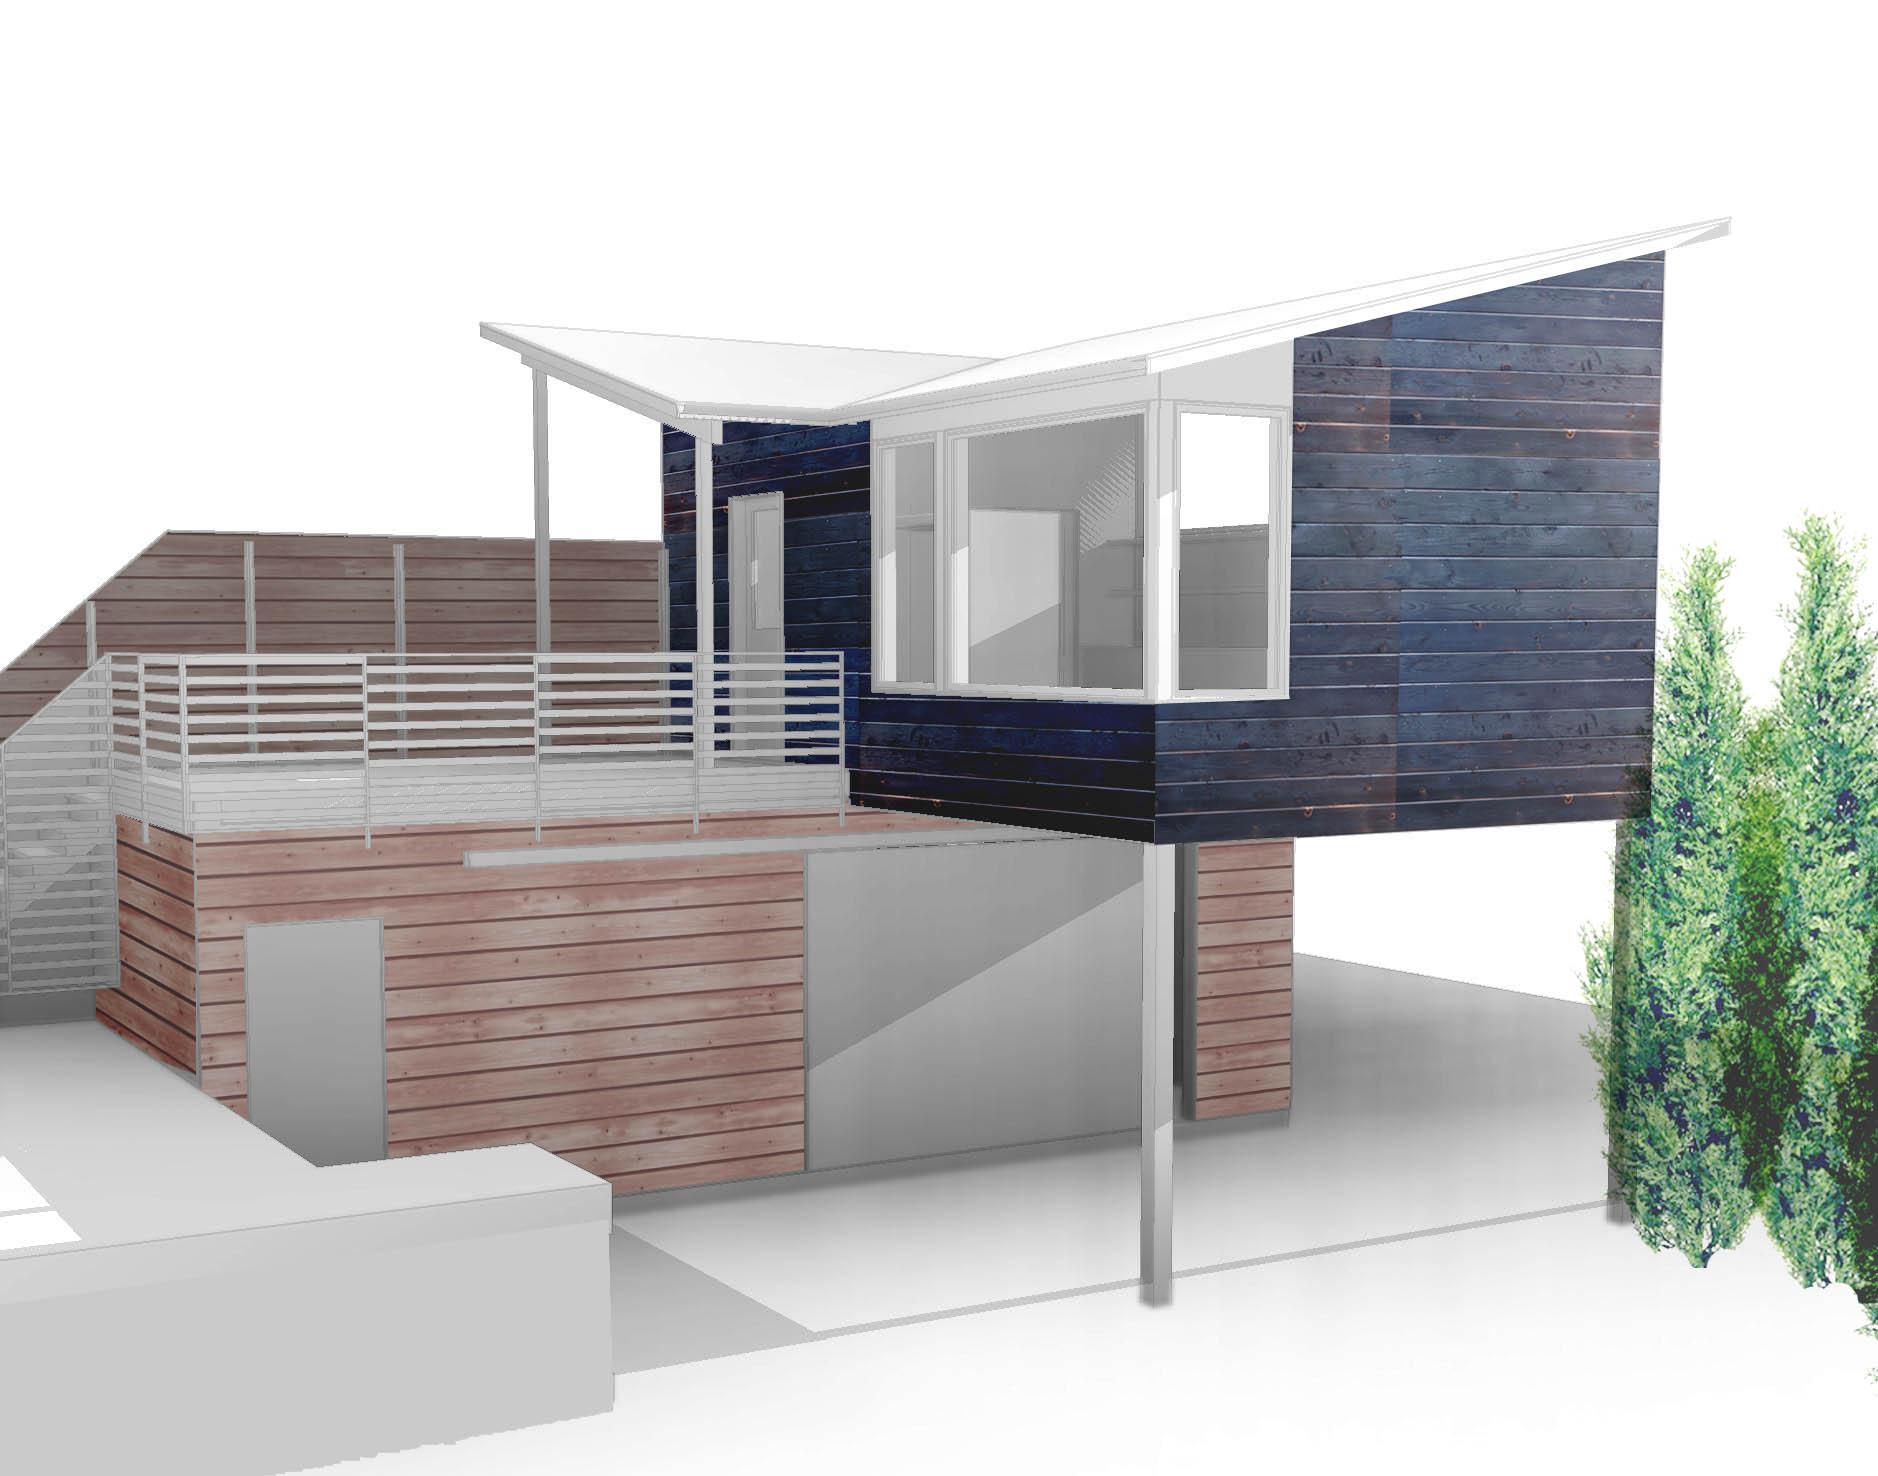 Gladstone studio and workshop_portland, or - exterior